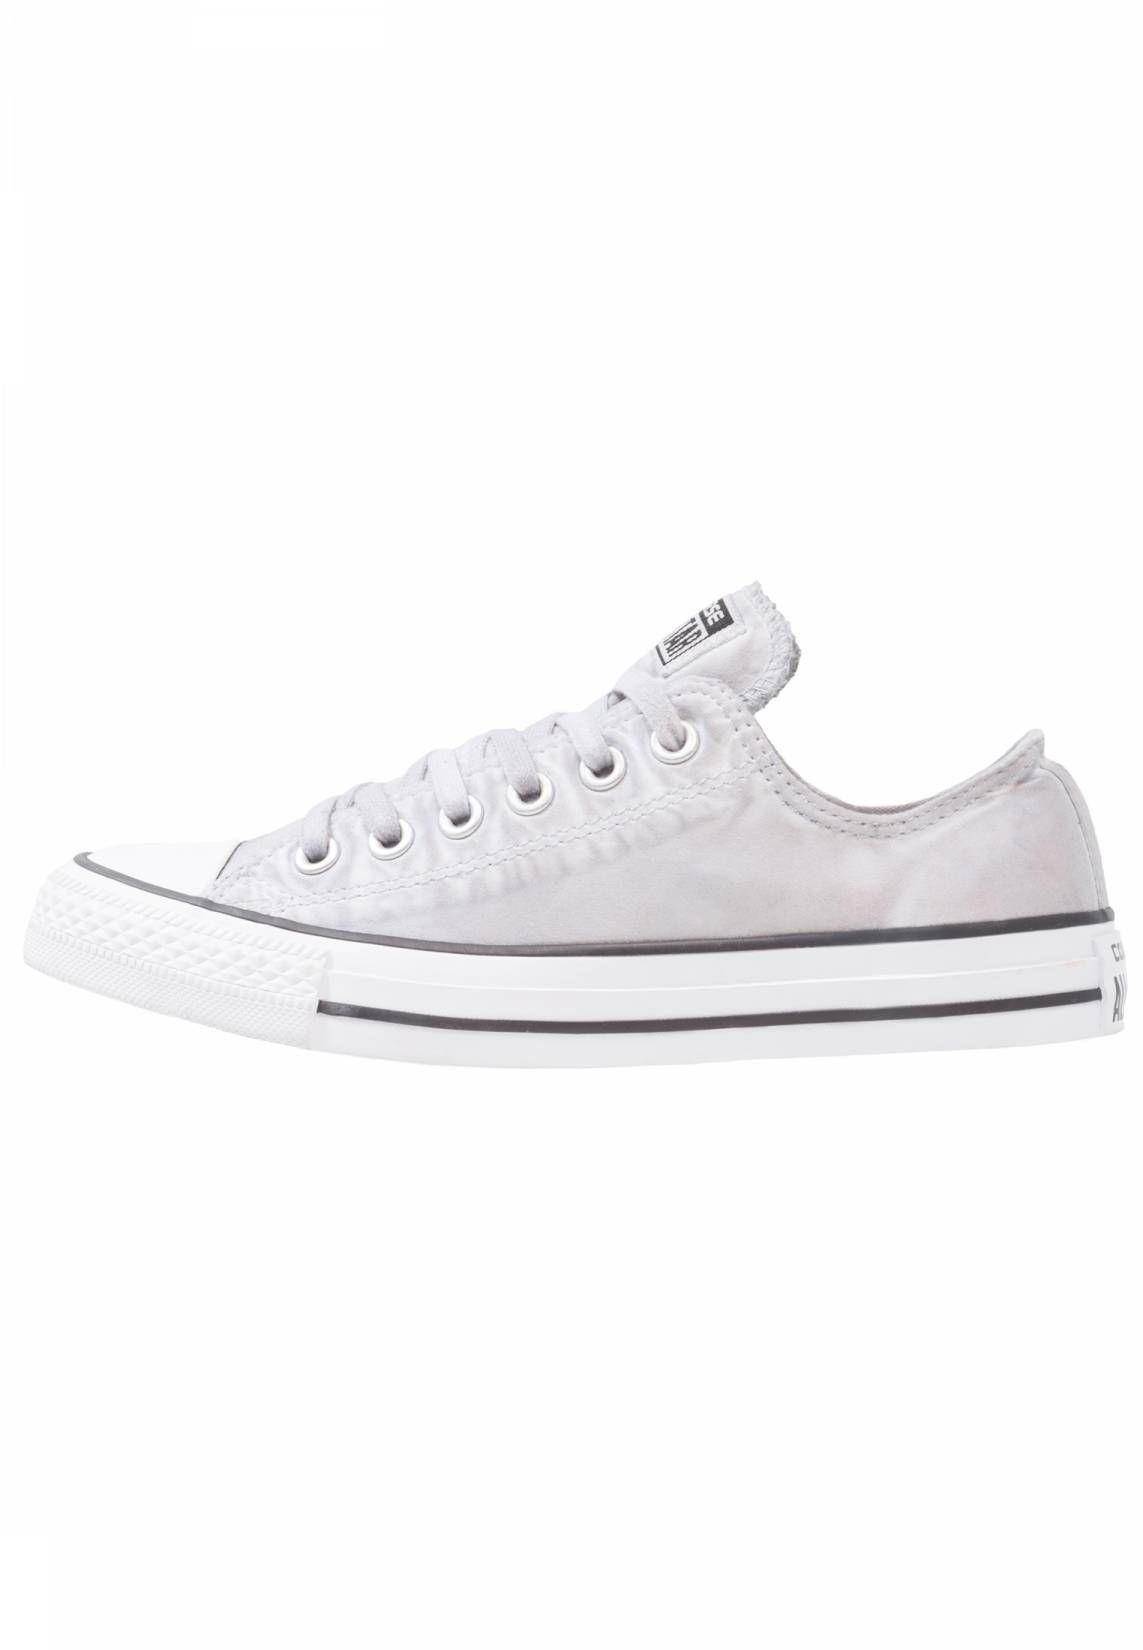 Converse. CHUCK TAYLOR ALL STAR KENT WASH Zapatillas